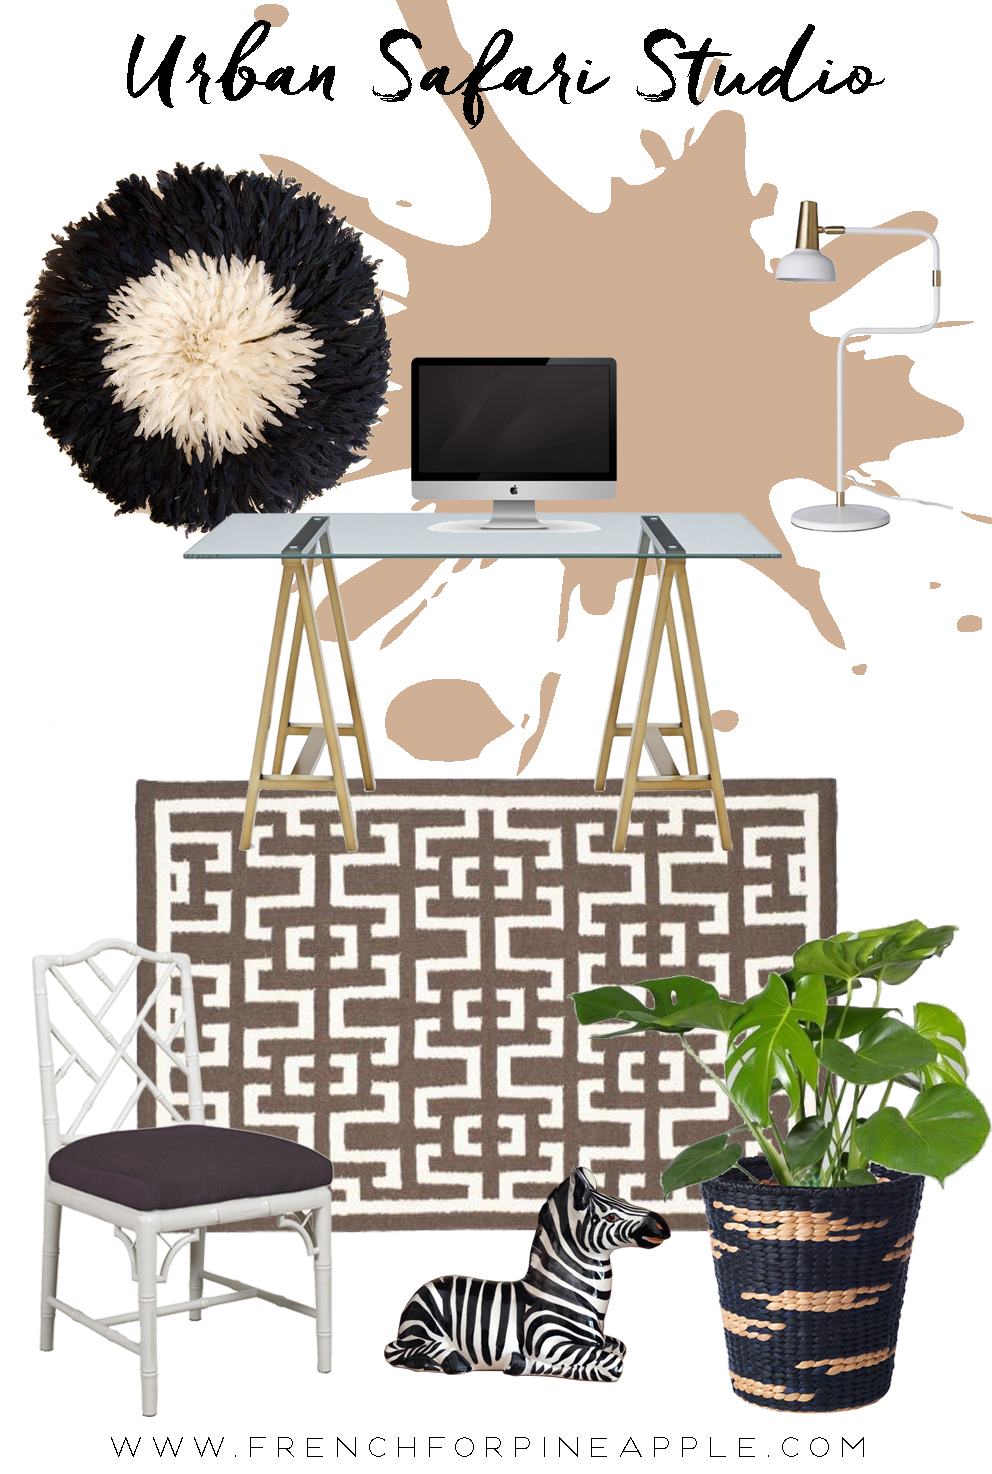 French For Pineapple Blog Urban Safari Studio Moodboard